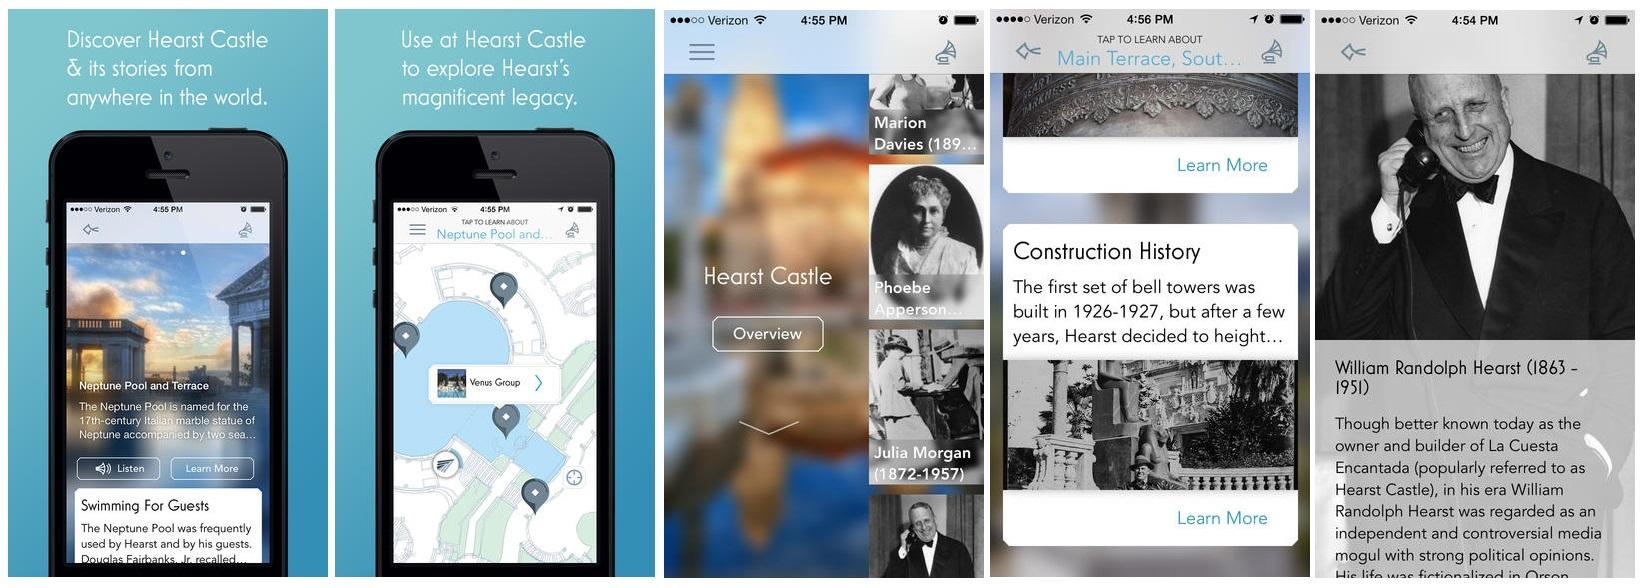 Приложение Hearst Castle для iOS